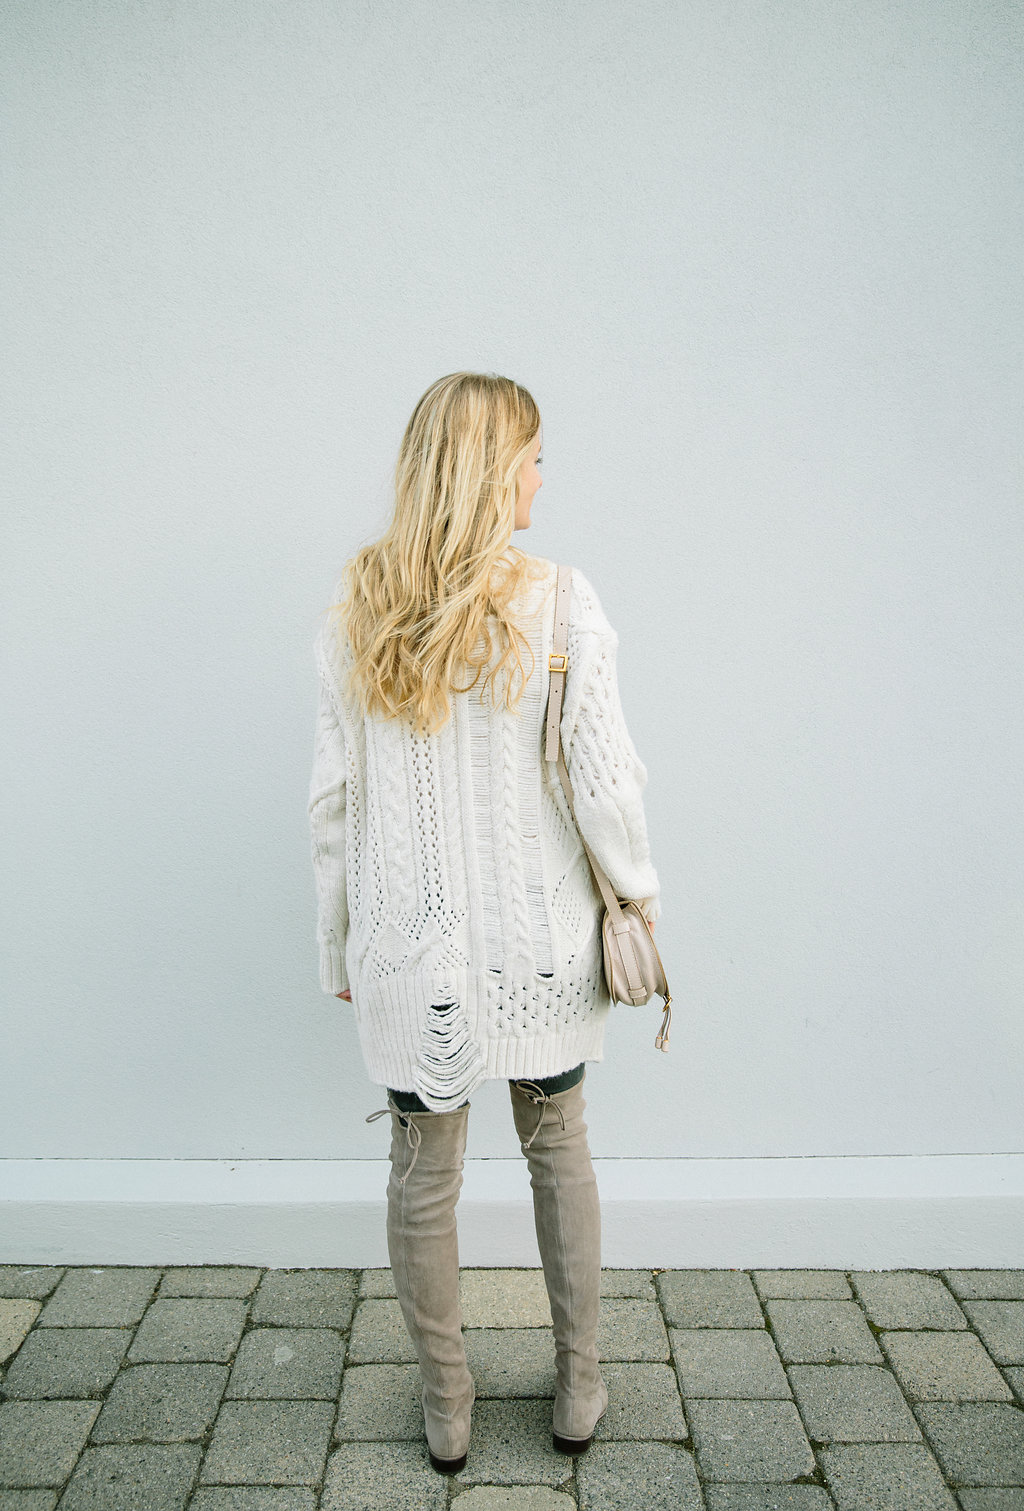 TheGirlGuide-StephanieTrotta-LindsayMaddenPhotography-18.jpg